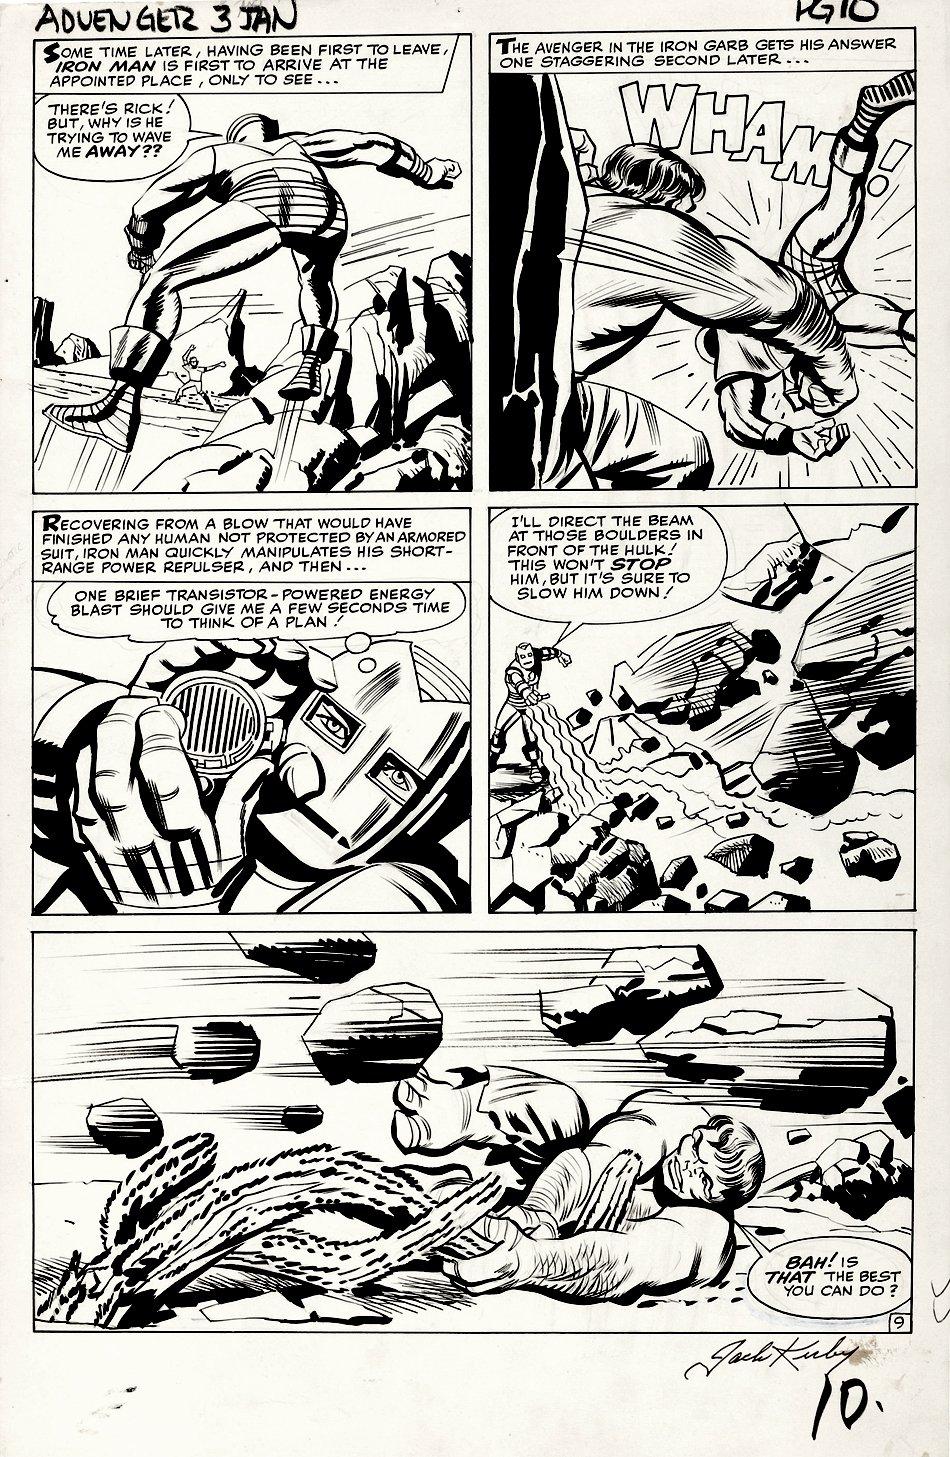 Avengers #3 p 9 (HISTORIC VERY FIRST HULK VS IRON MAN BATTLE PAGE!) Large Art 1963